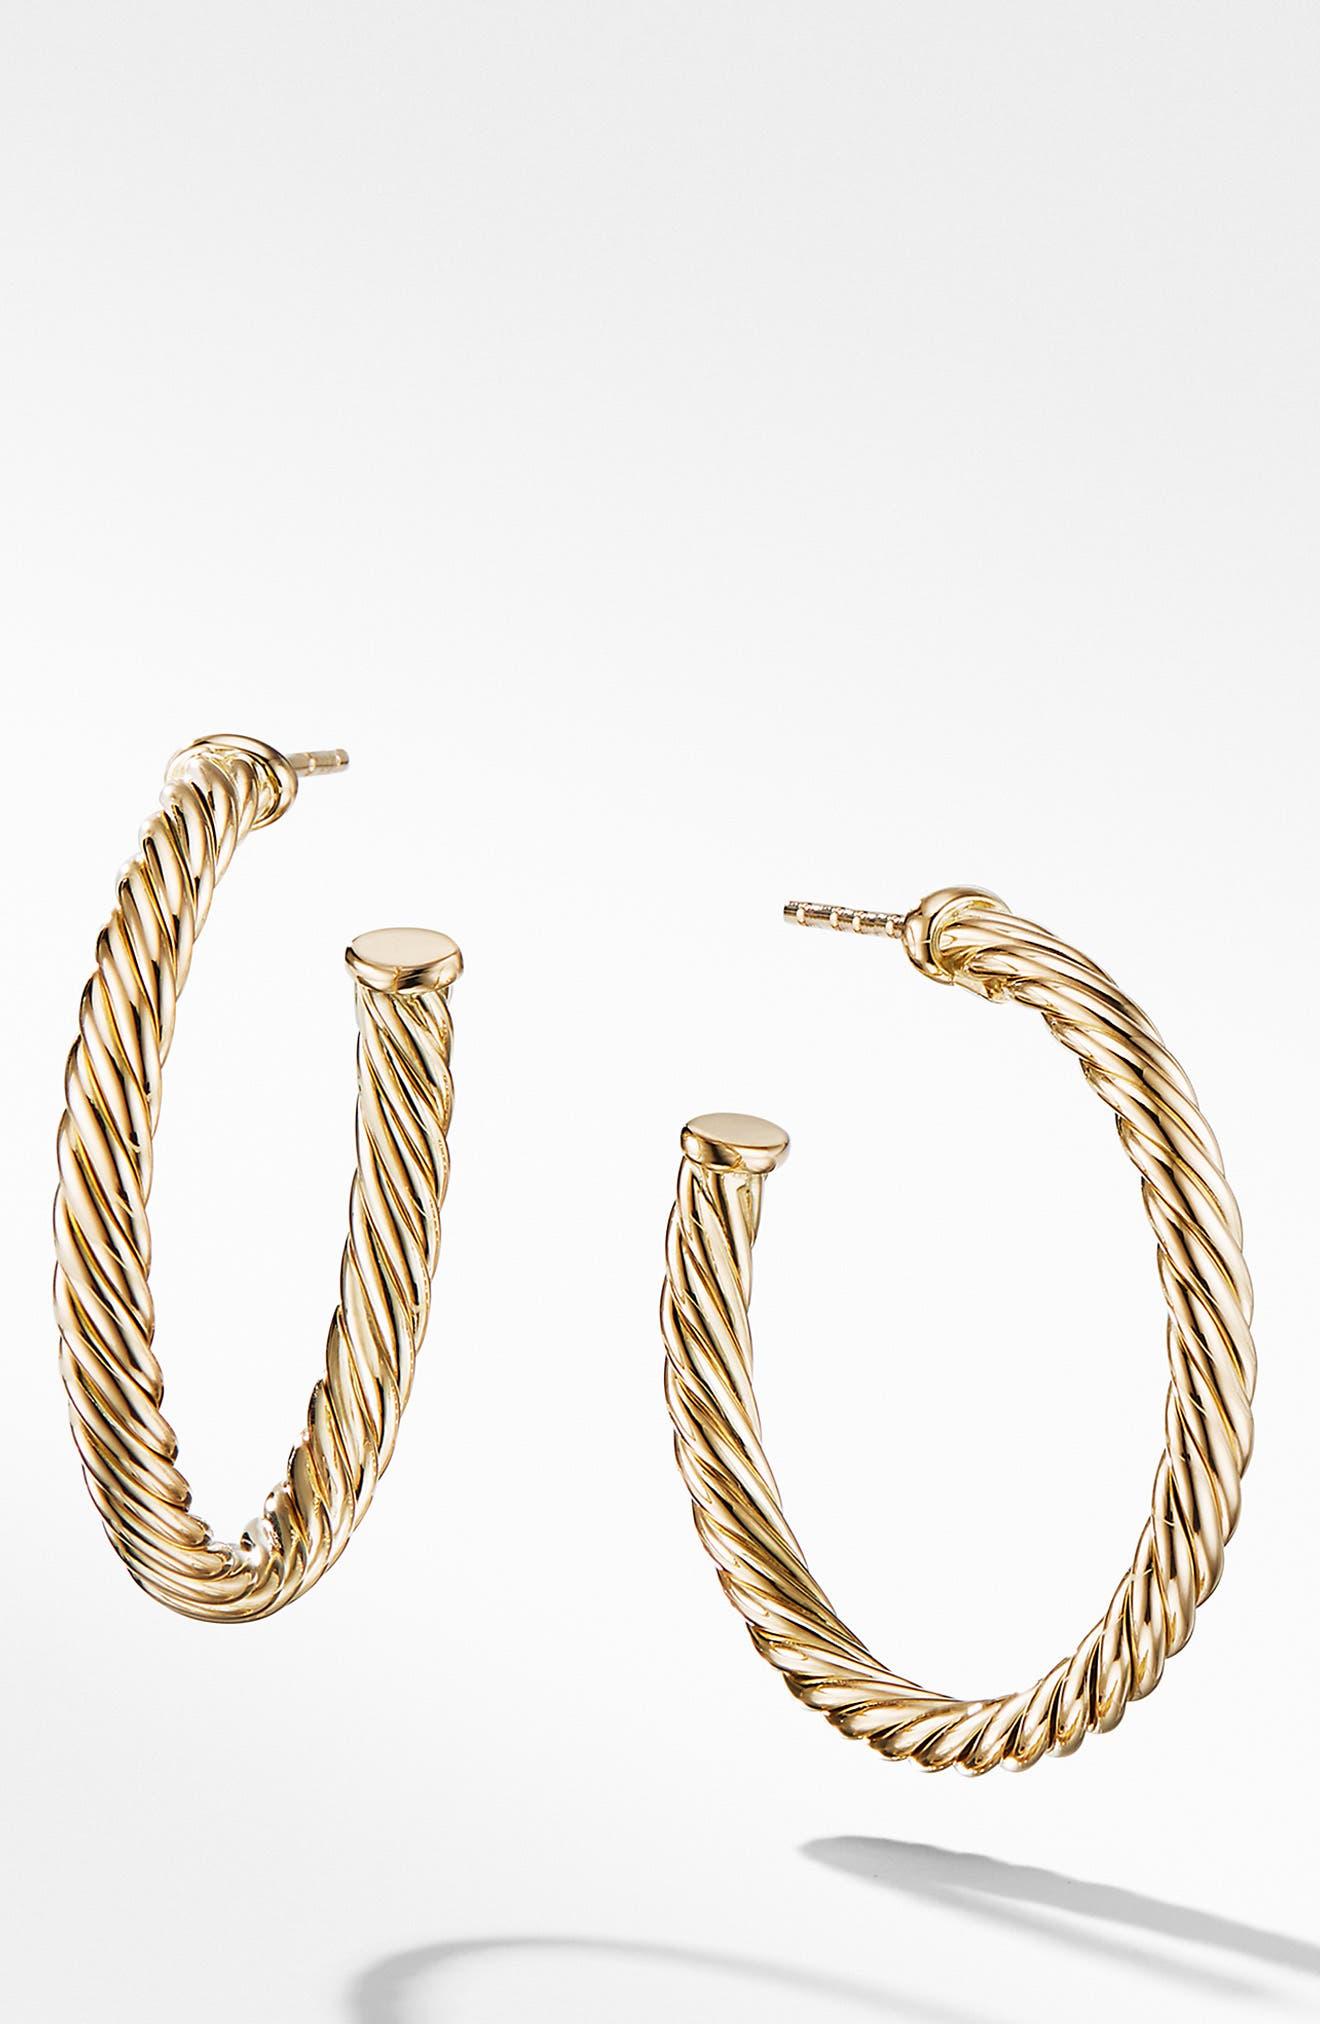 DAVID YURMAN Cable Loop Hoop Earrings, Main, color, GOLD